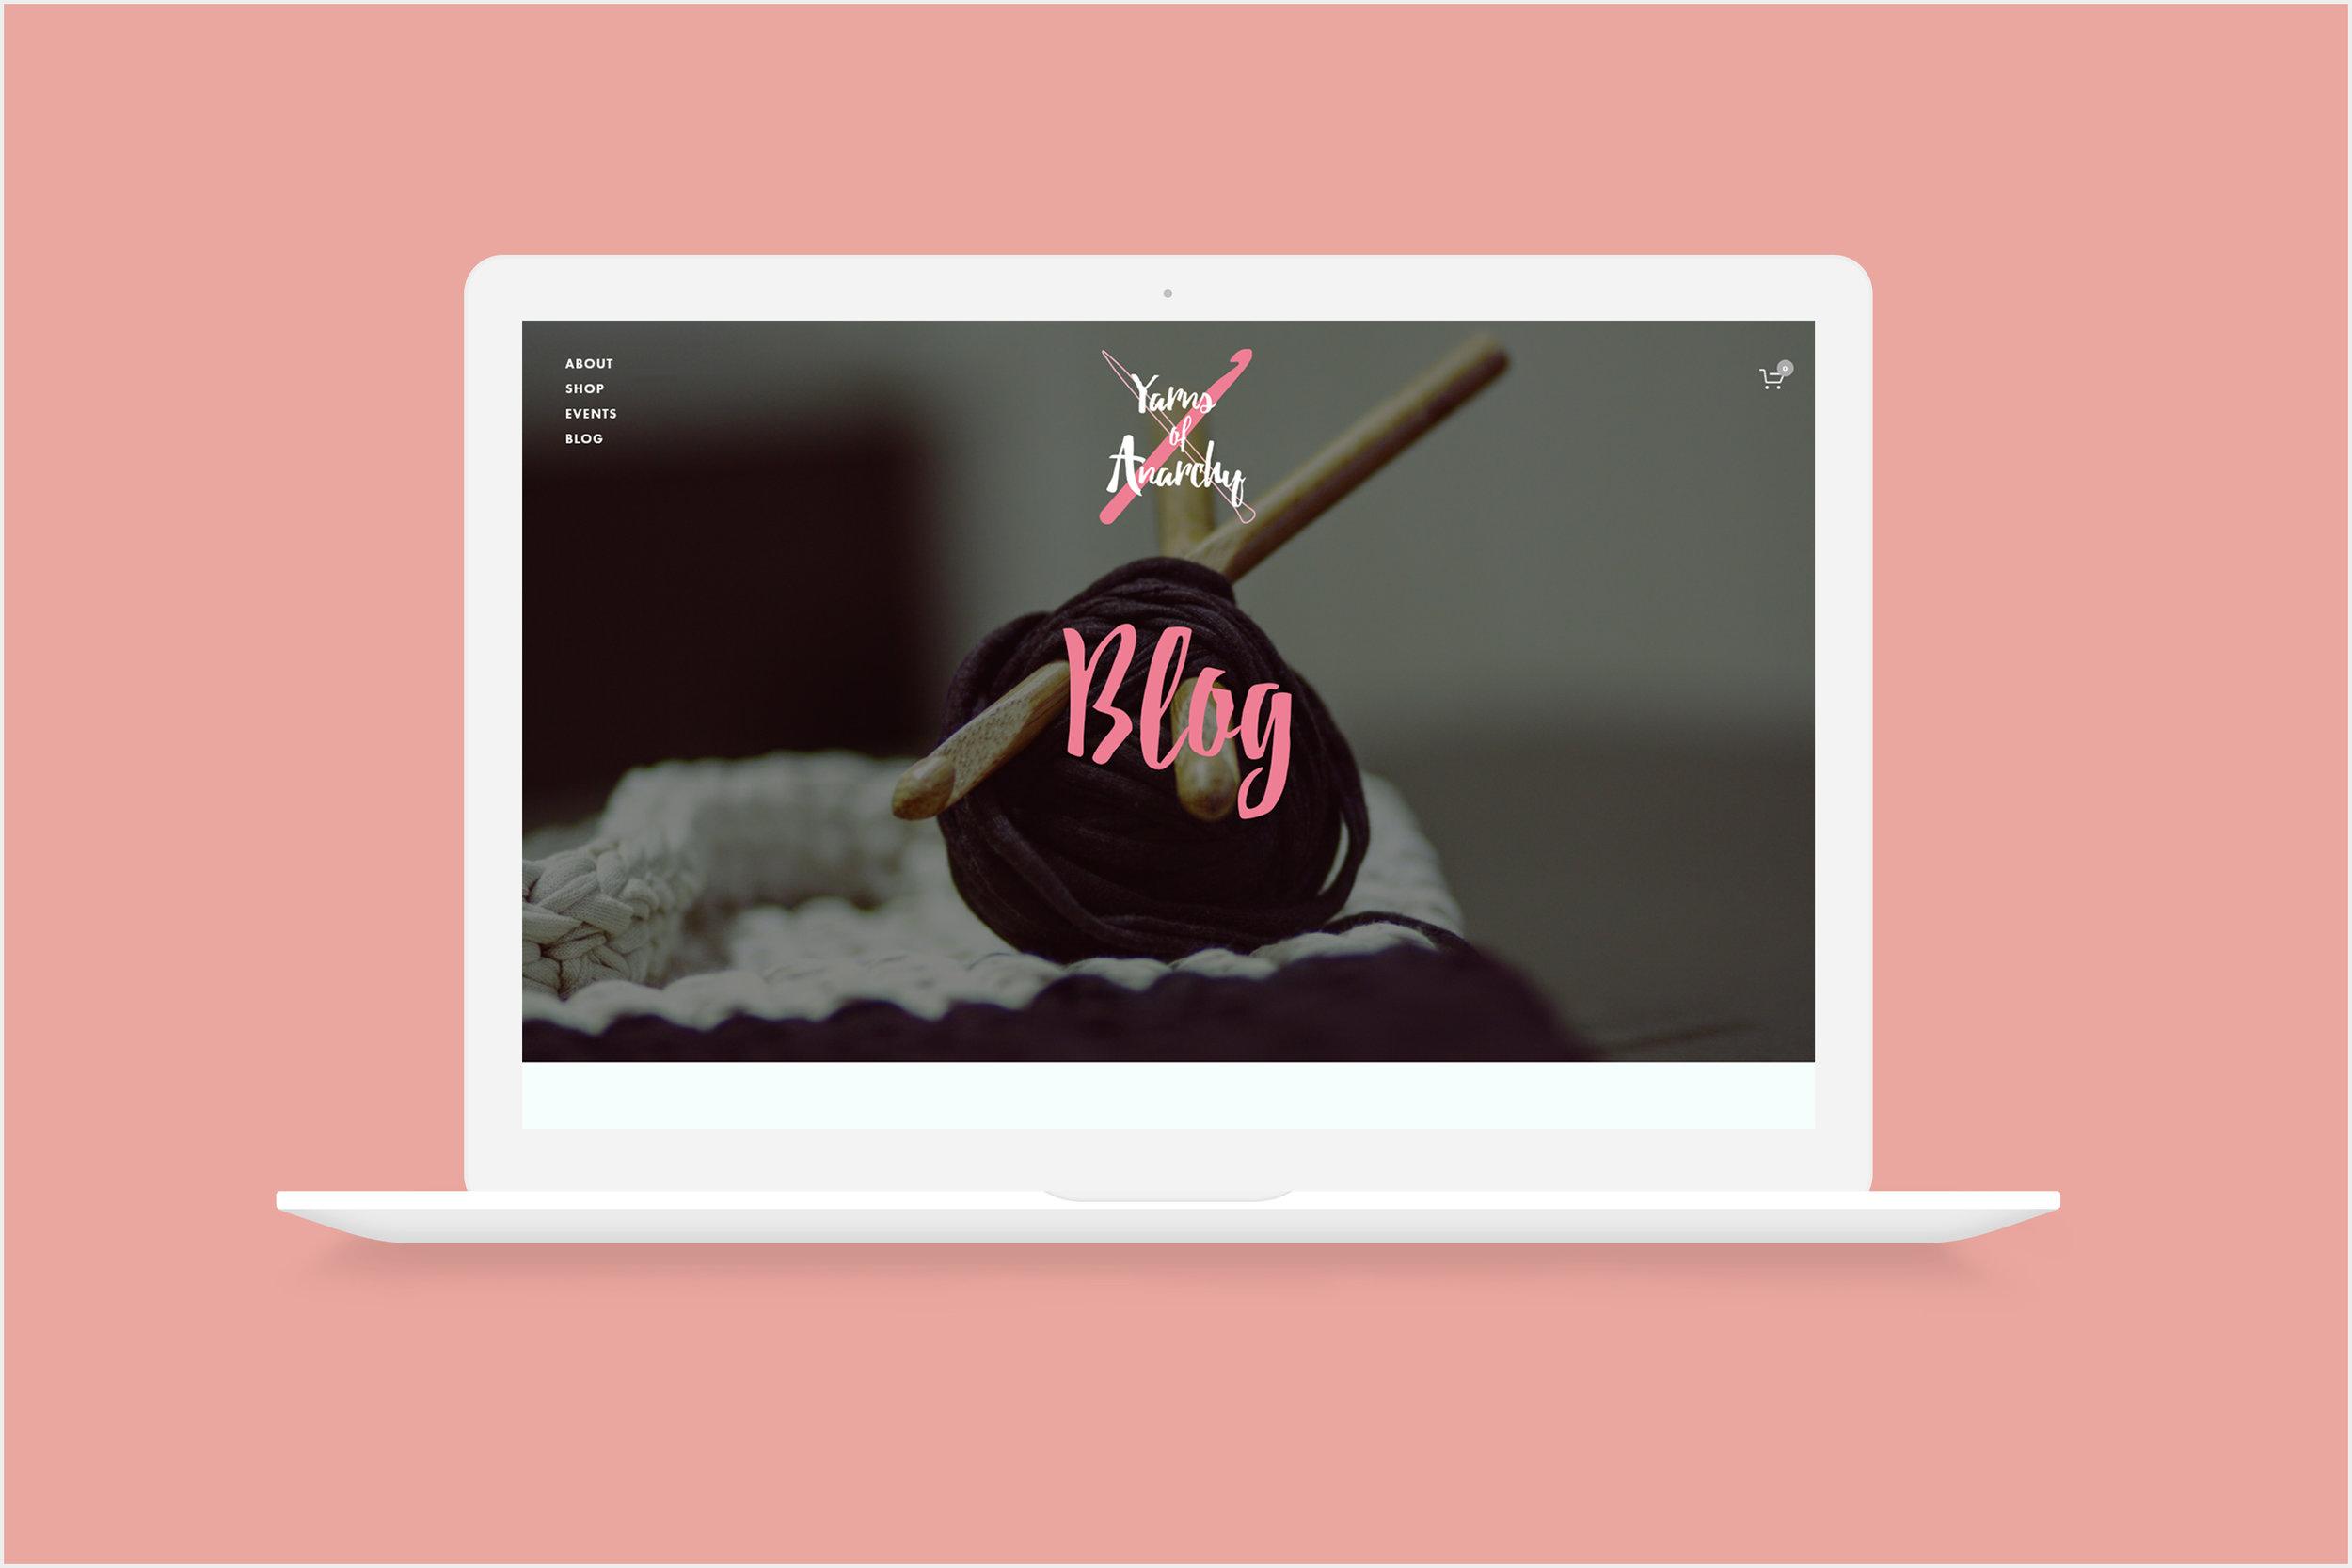 yarns-of-anarchy-and-bgsd-website-design-blog.jpg